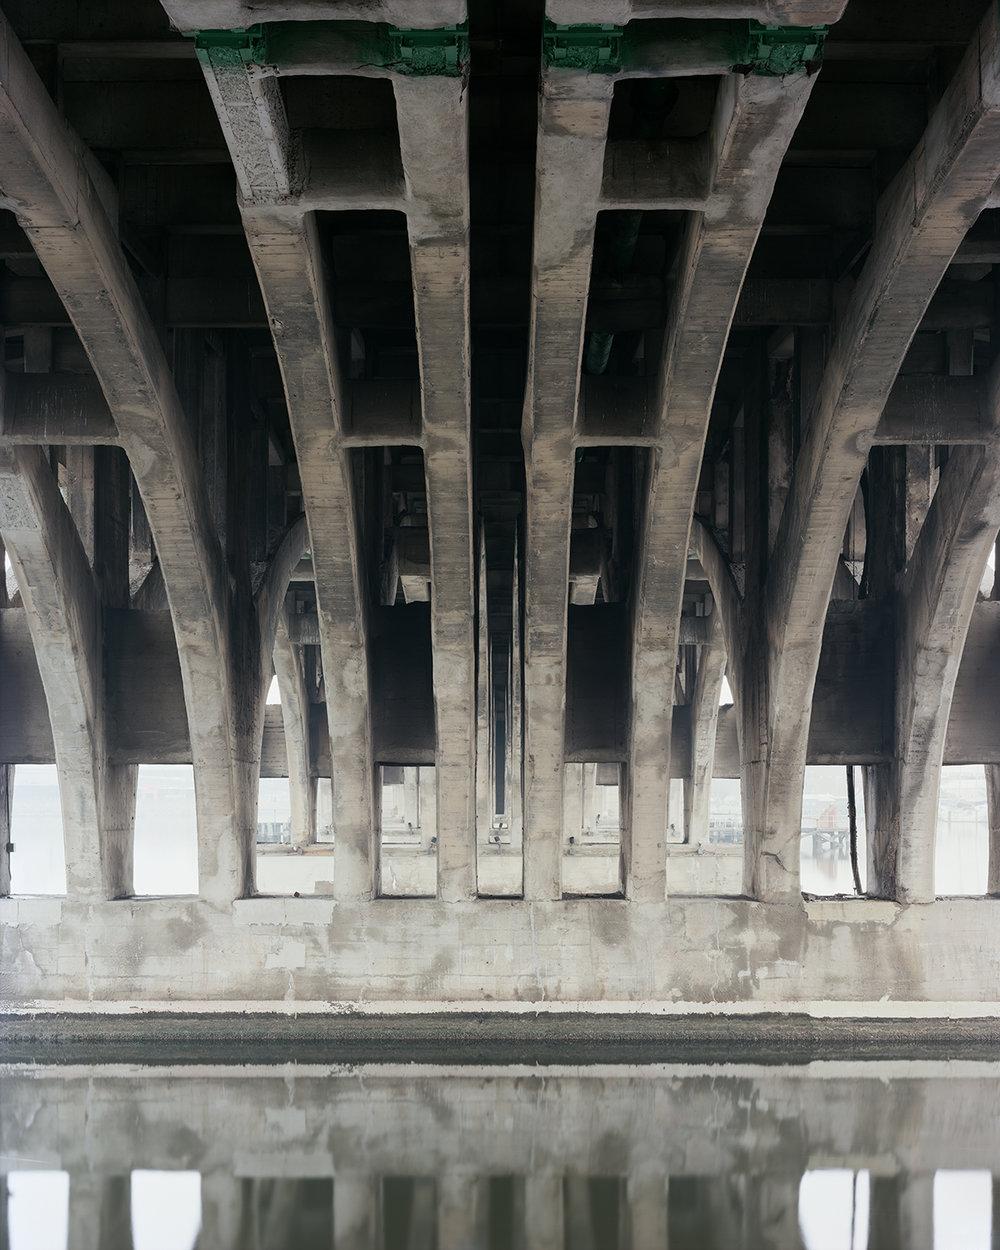 Hanover Street Bascule Bridge, Baltimore, MD. 2016